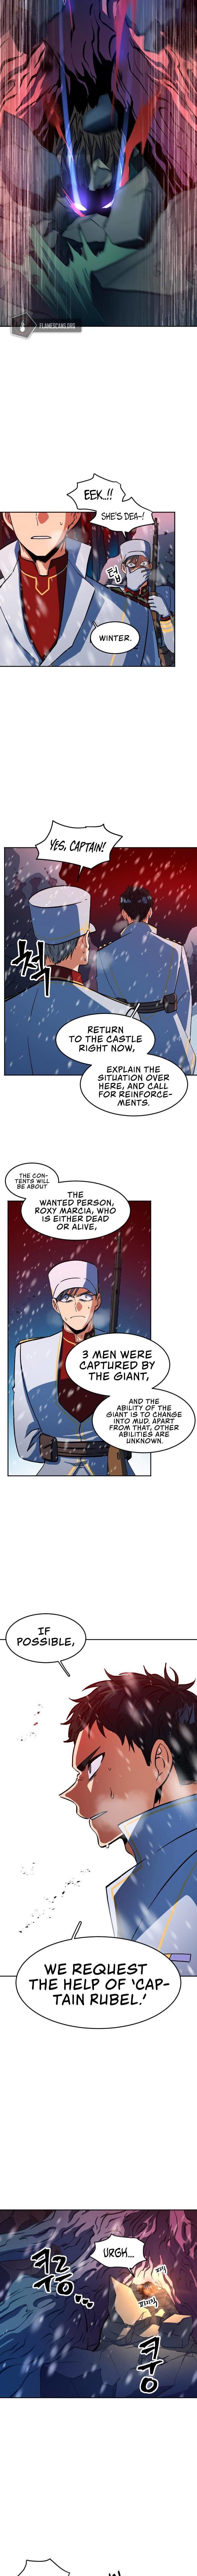 The Last Golden Child Chapter 13 page 13 - Mangakakalots.com